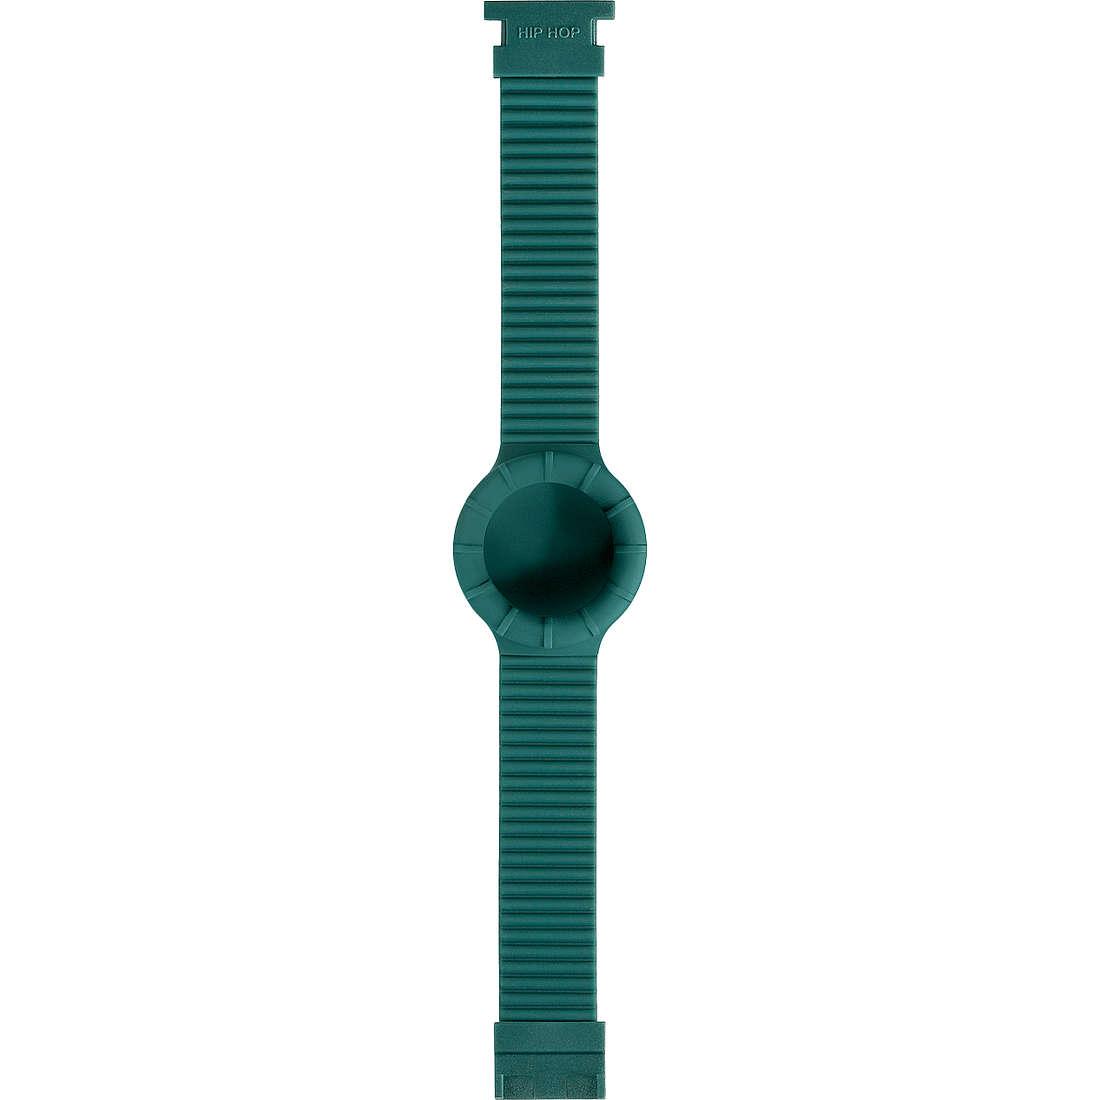 orologio accessorio unisex Hip Hop HBU0029